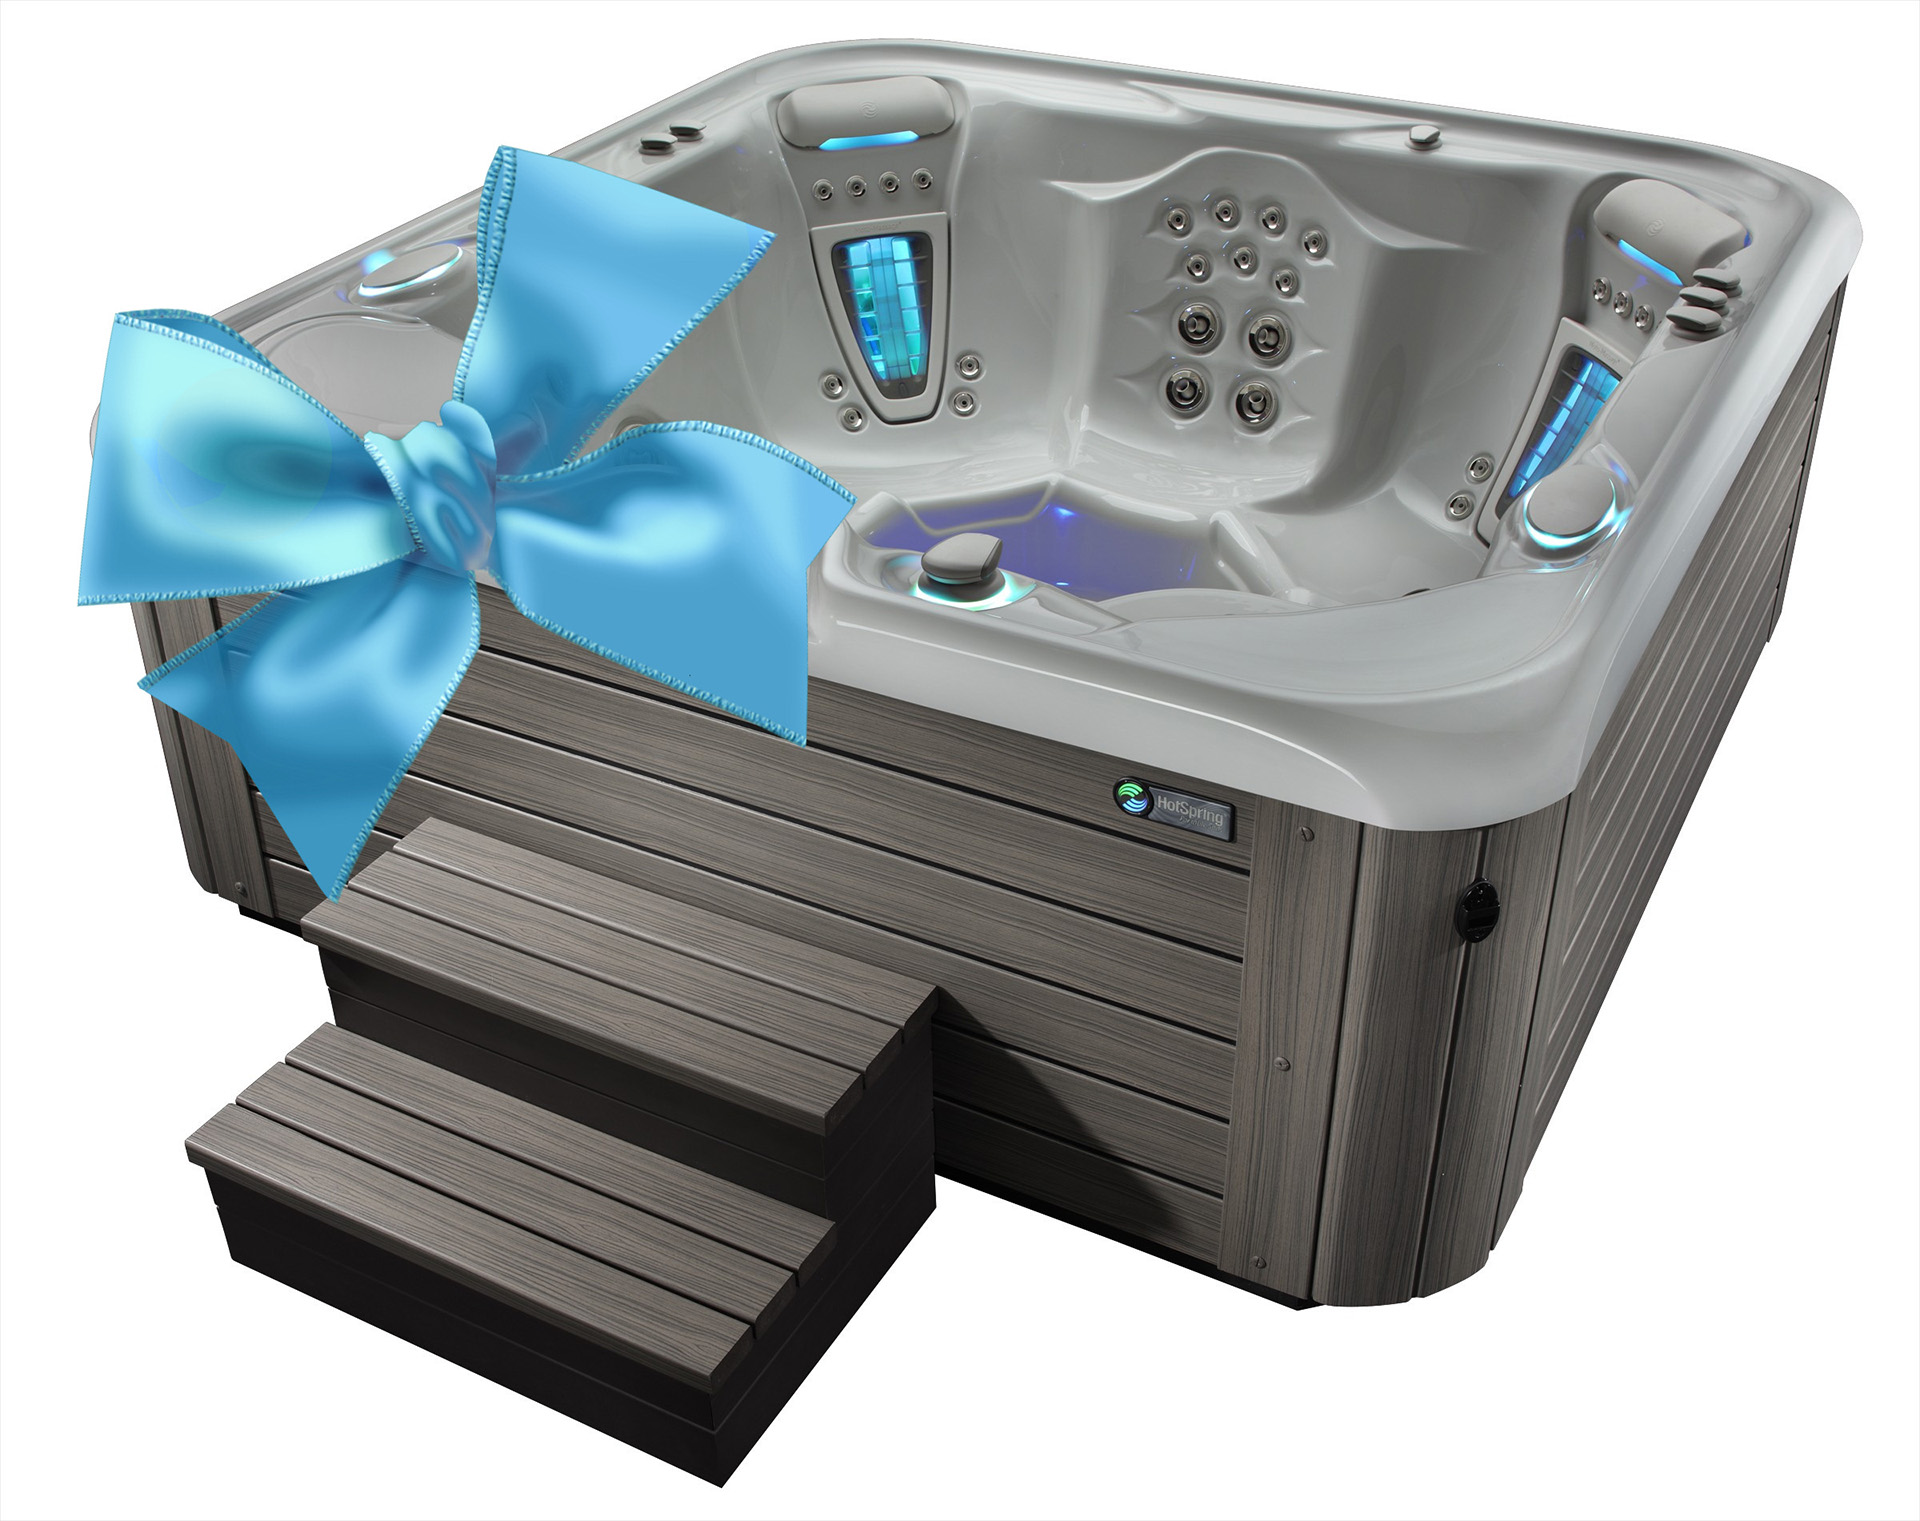 tub swim company spas arizona hot lifestyle kids pr thank spring you hotspring highlife alpinewhite vanguardnxt tubs teak saunas